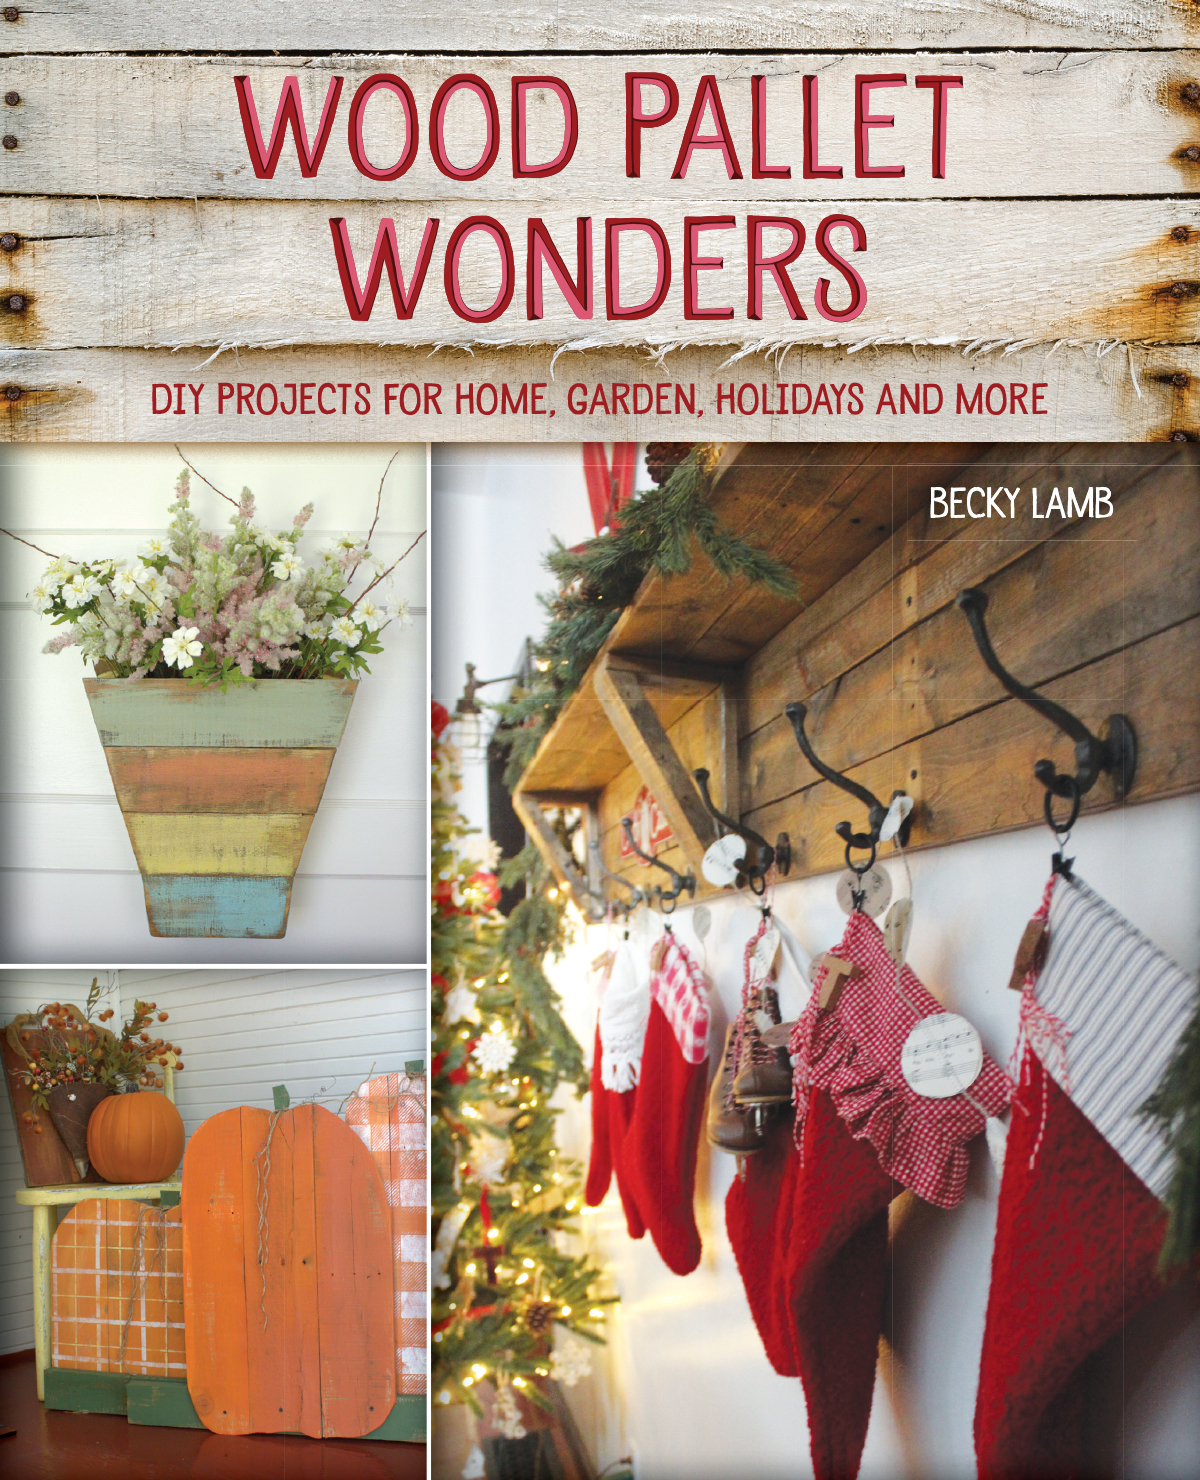 Wood Pallet Wonders - Becky Lamb